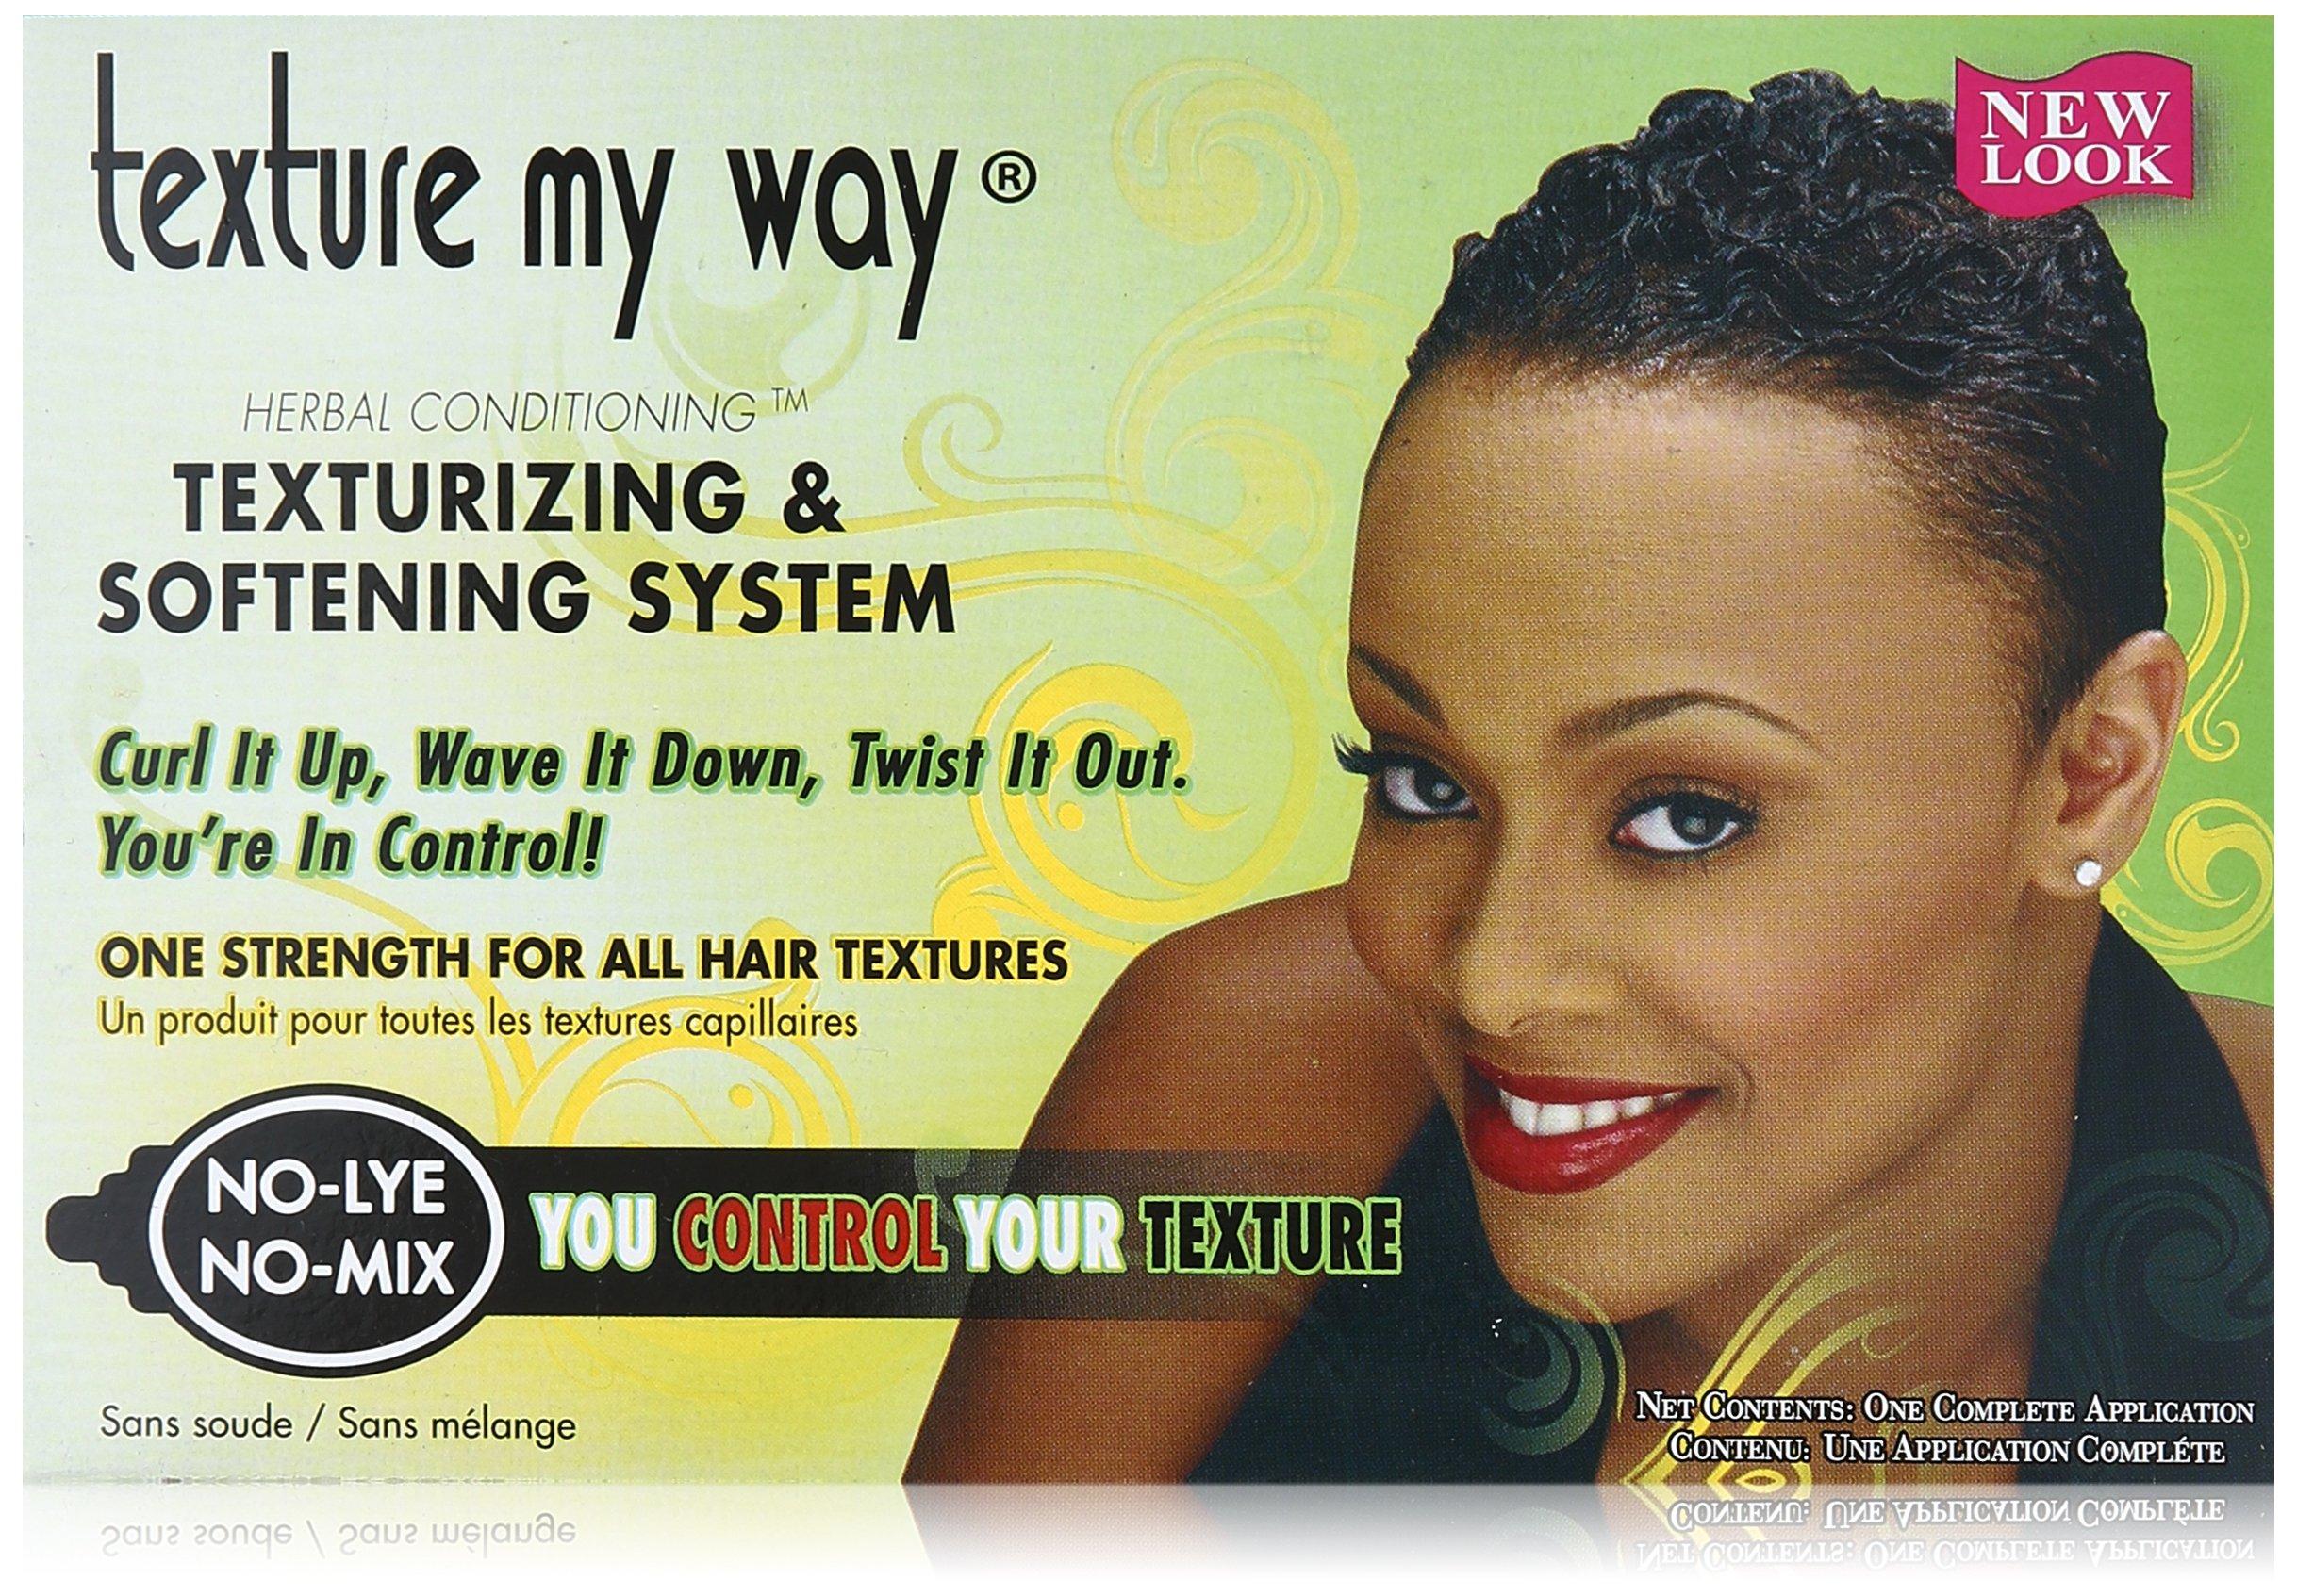 Organics My Way No-Lye Organic Conditioning Texturizing System